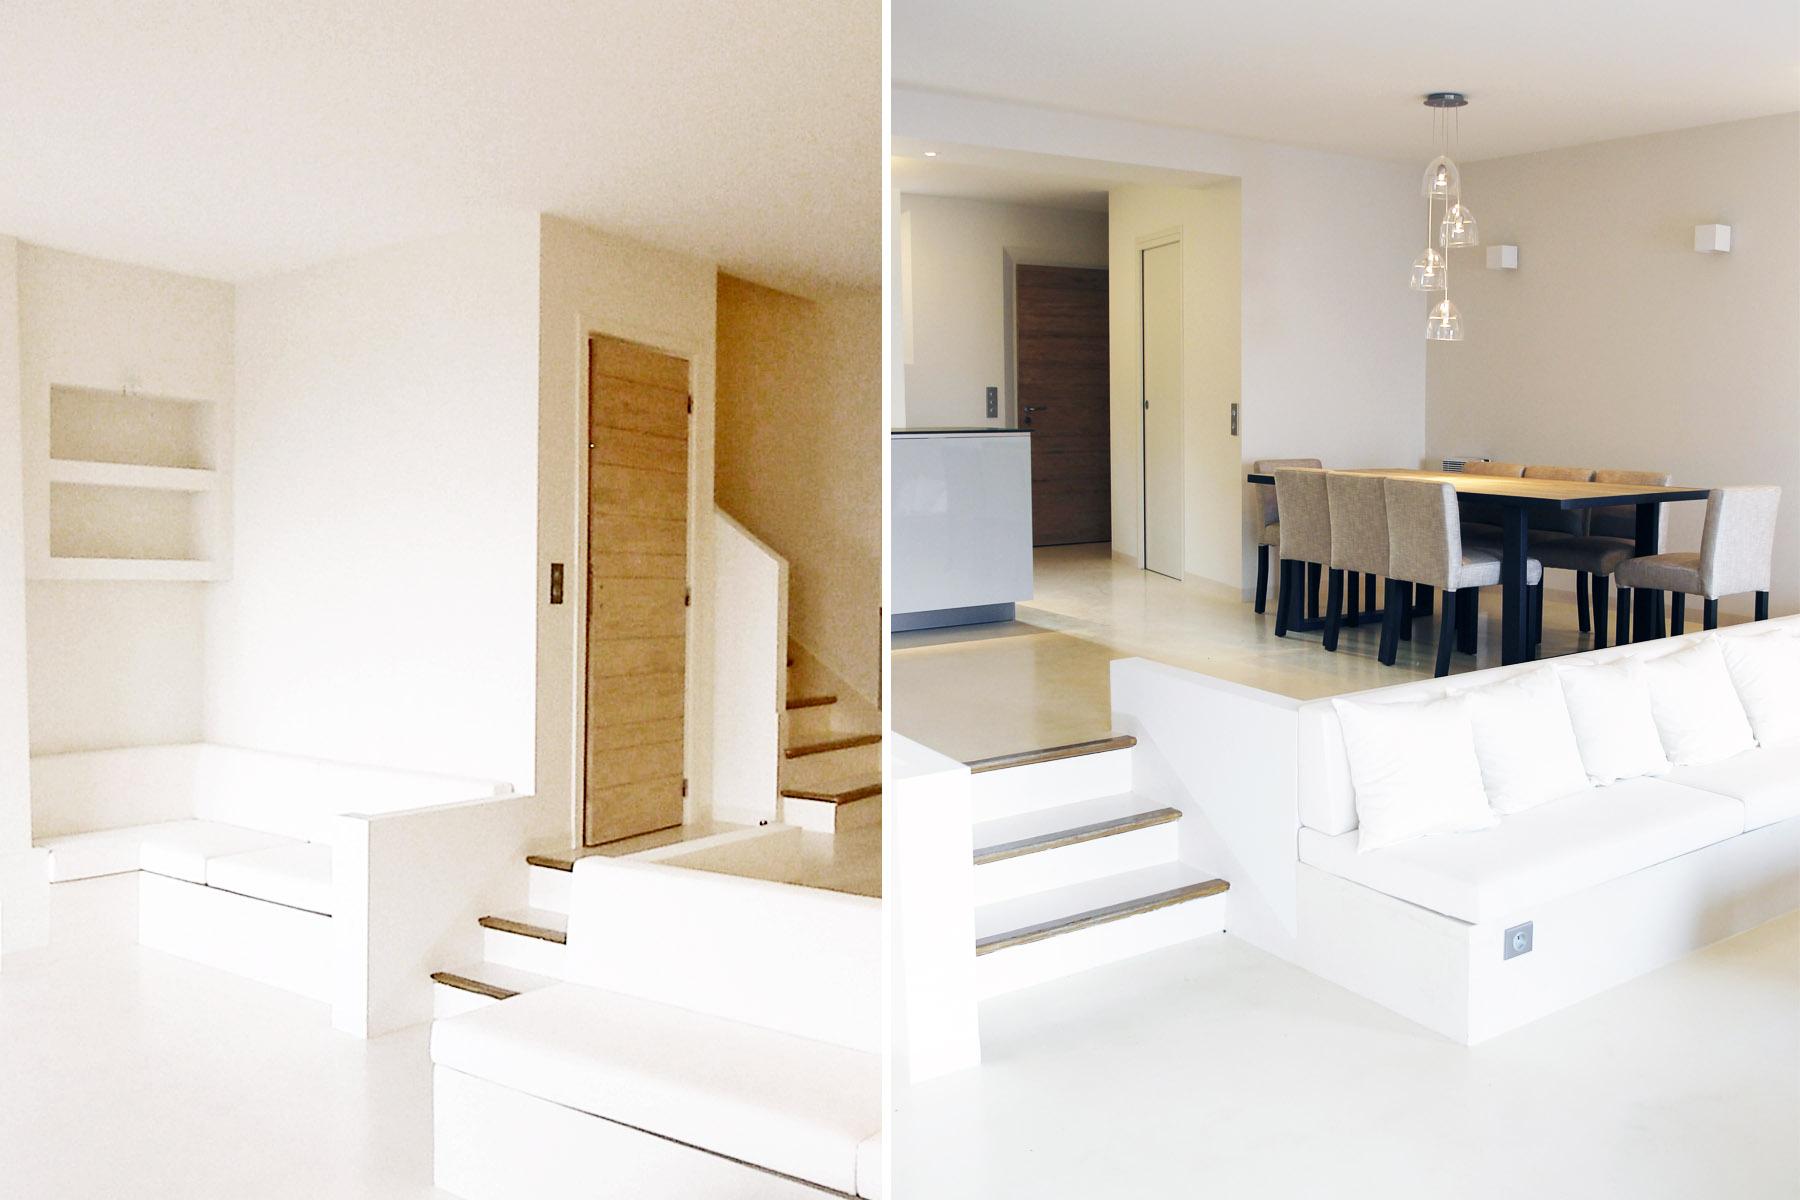 L2-Florence_Watine_Architecte_Designer_Decoratrice_Paris_France-1